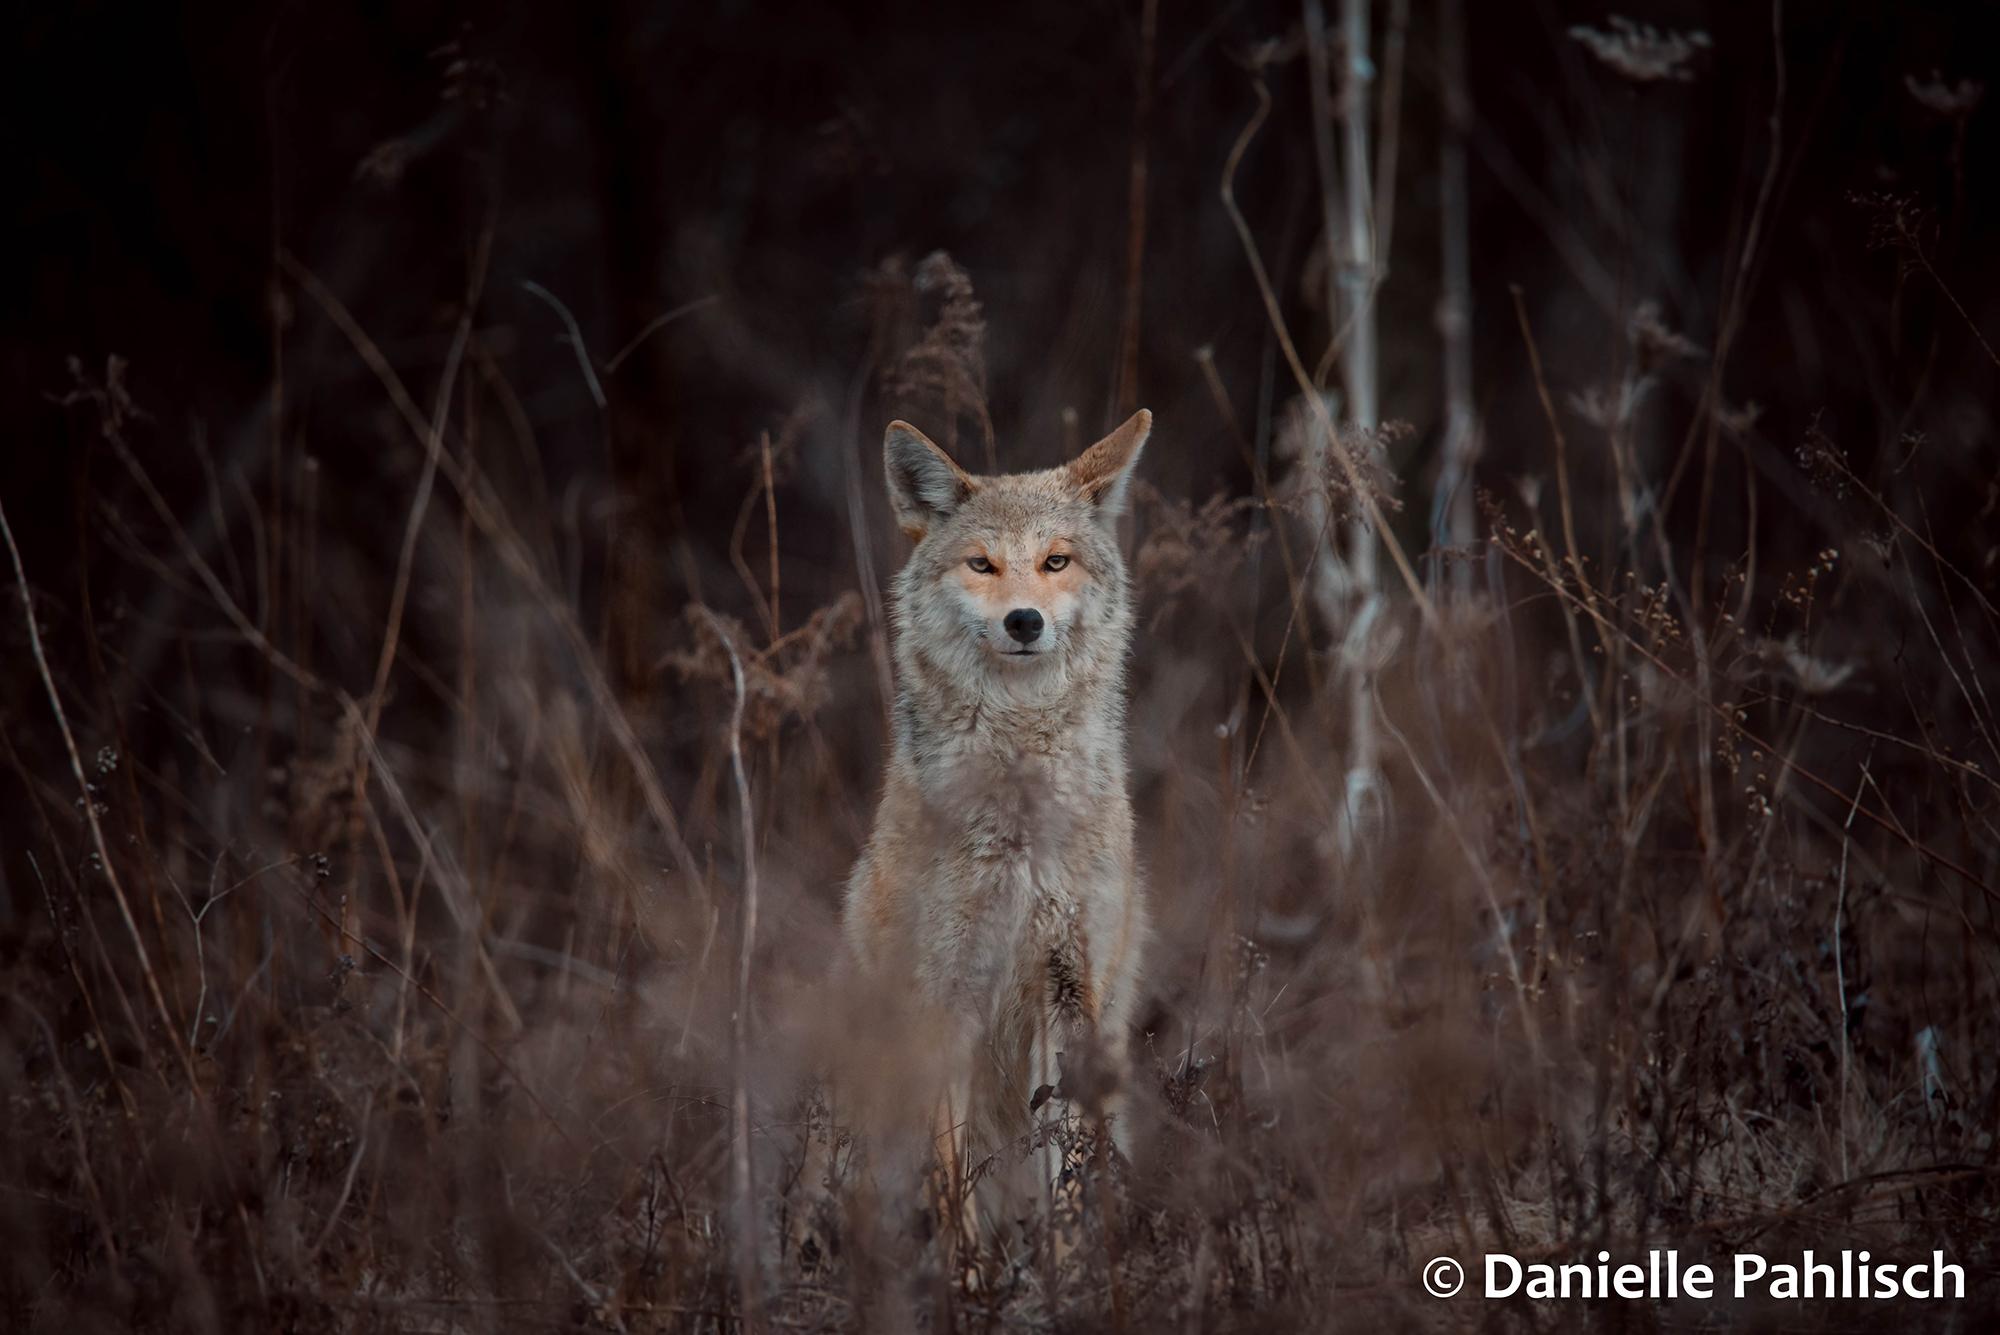 Coyote of Sanctuary Woods - Danielle Pahlisch